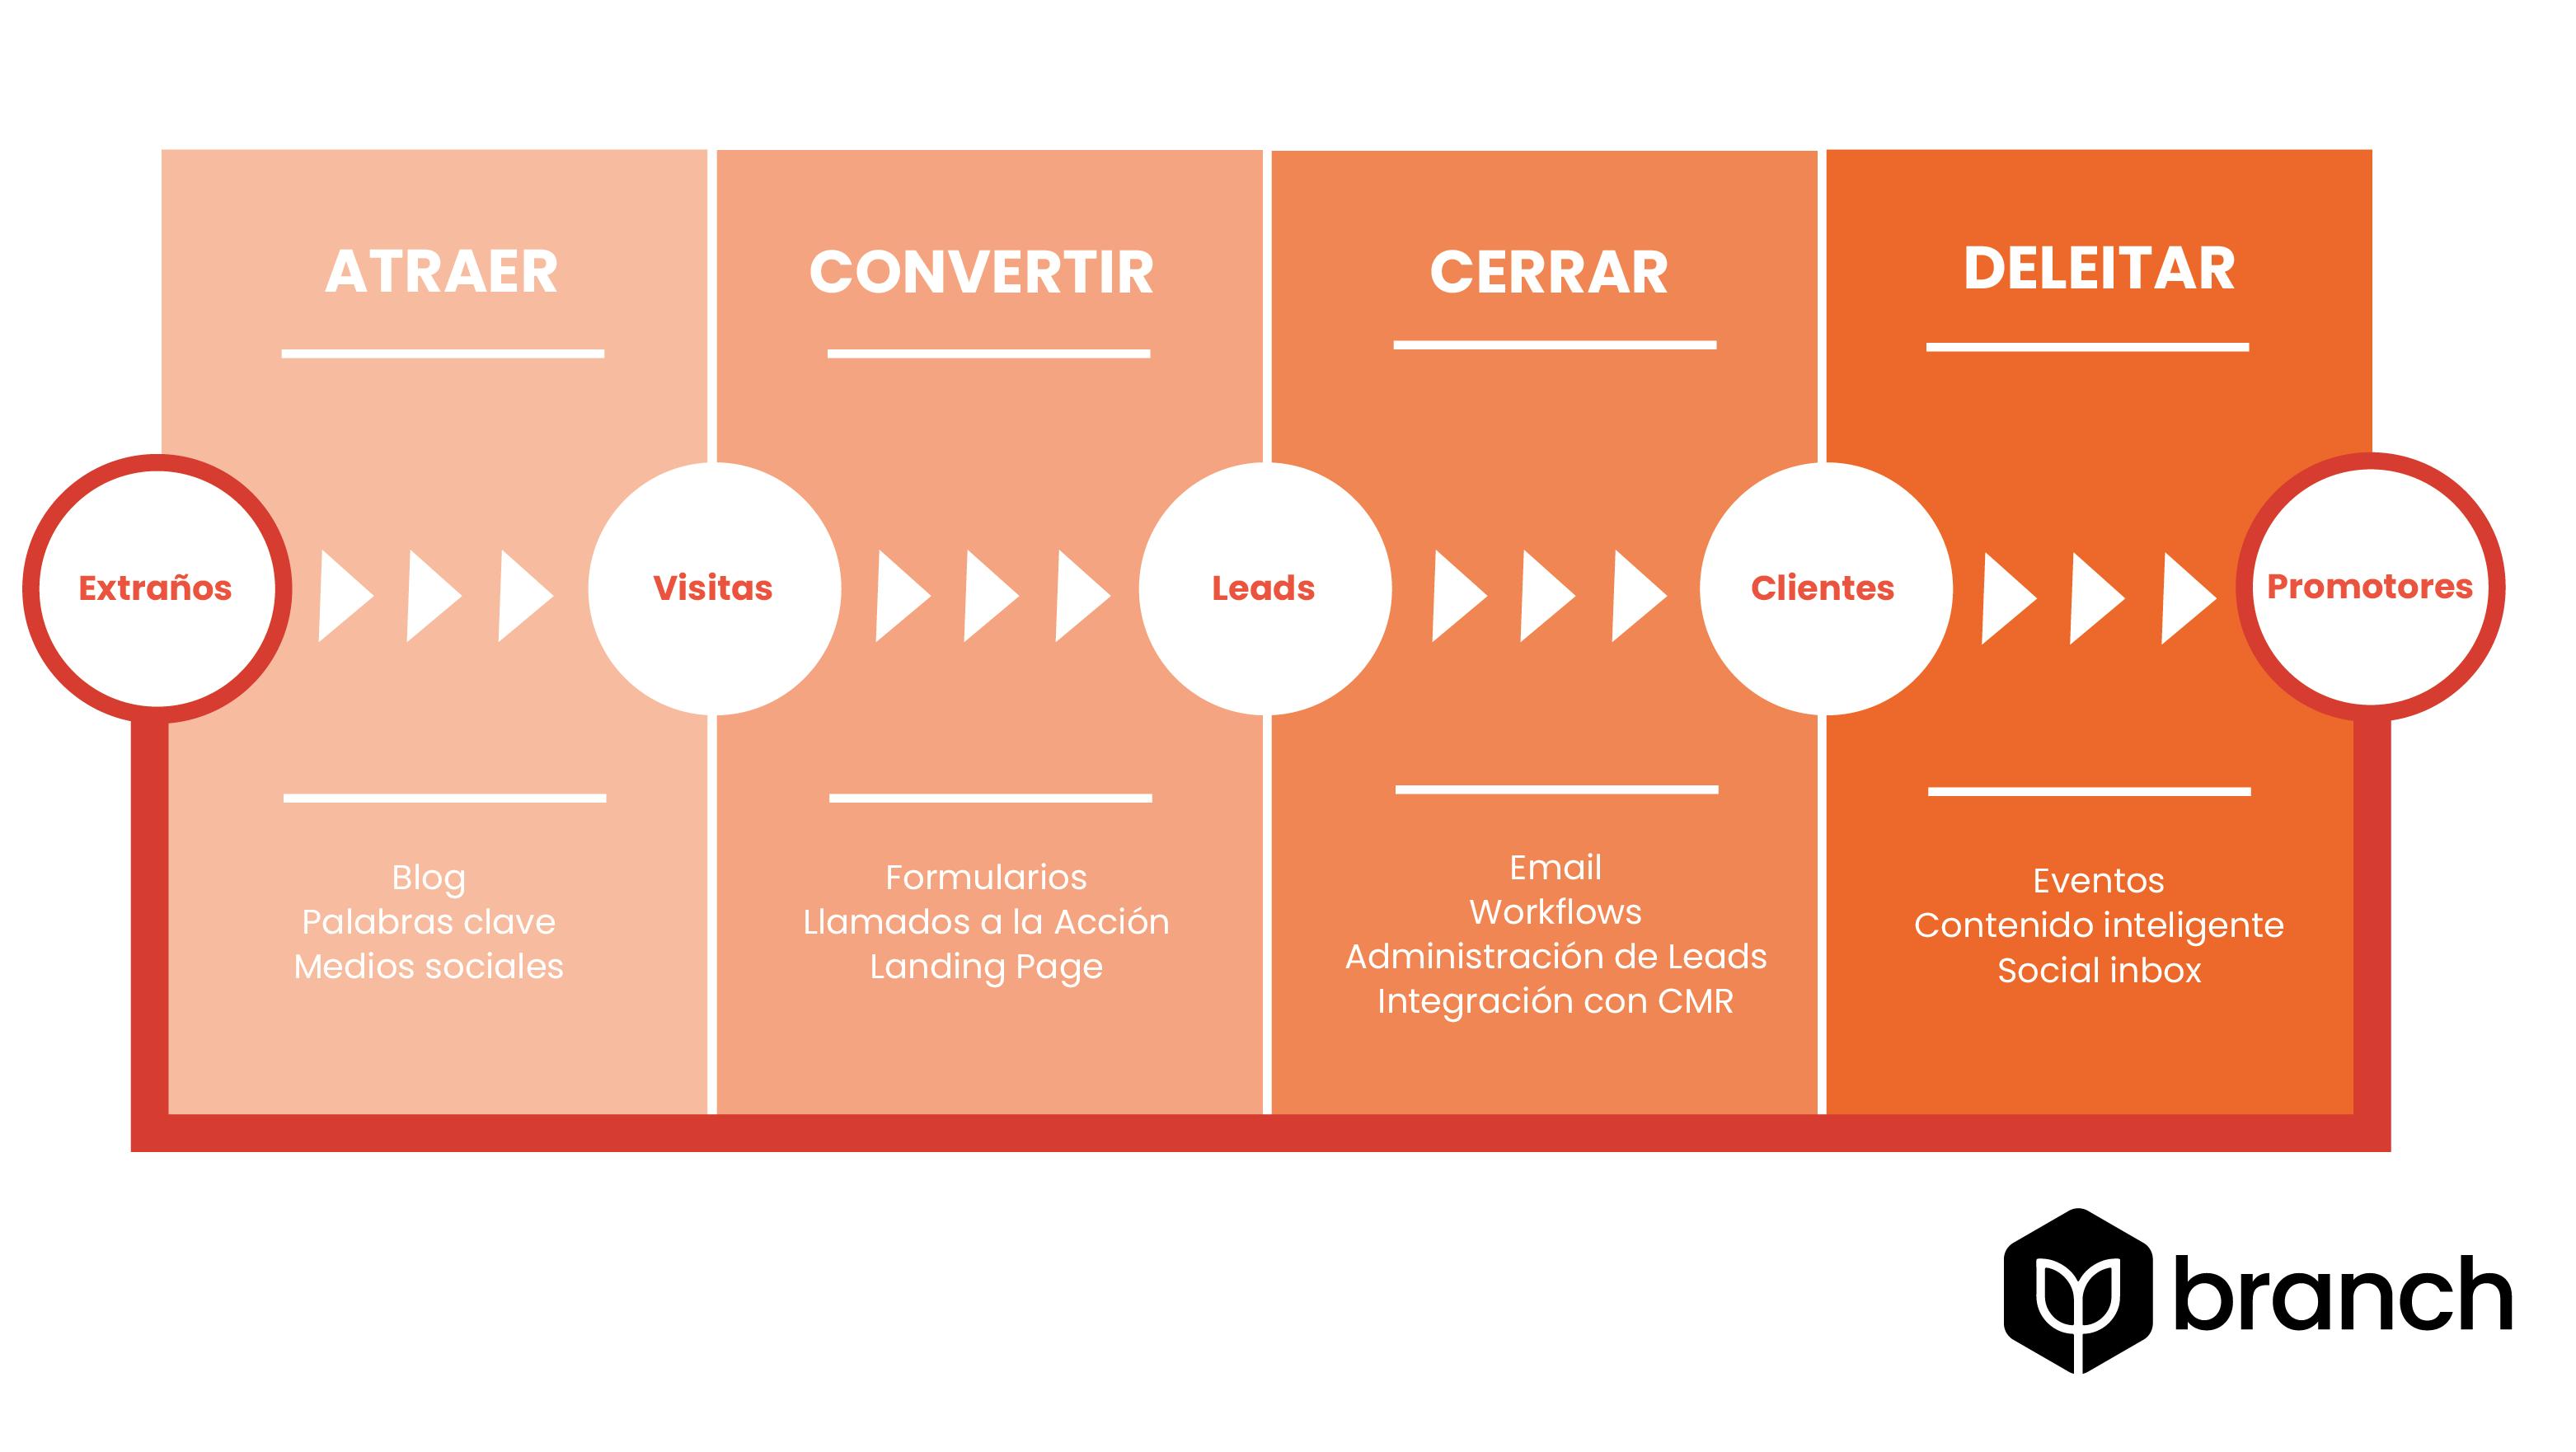 metodologia-inbound-marketing-atraer-convertir-cerrar-deleitar